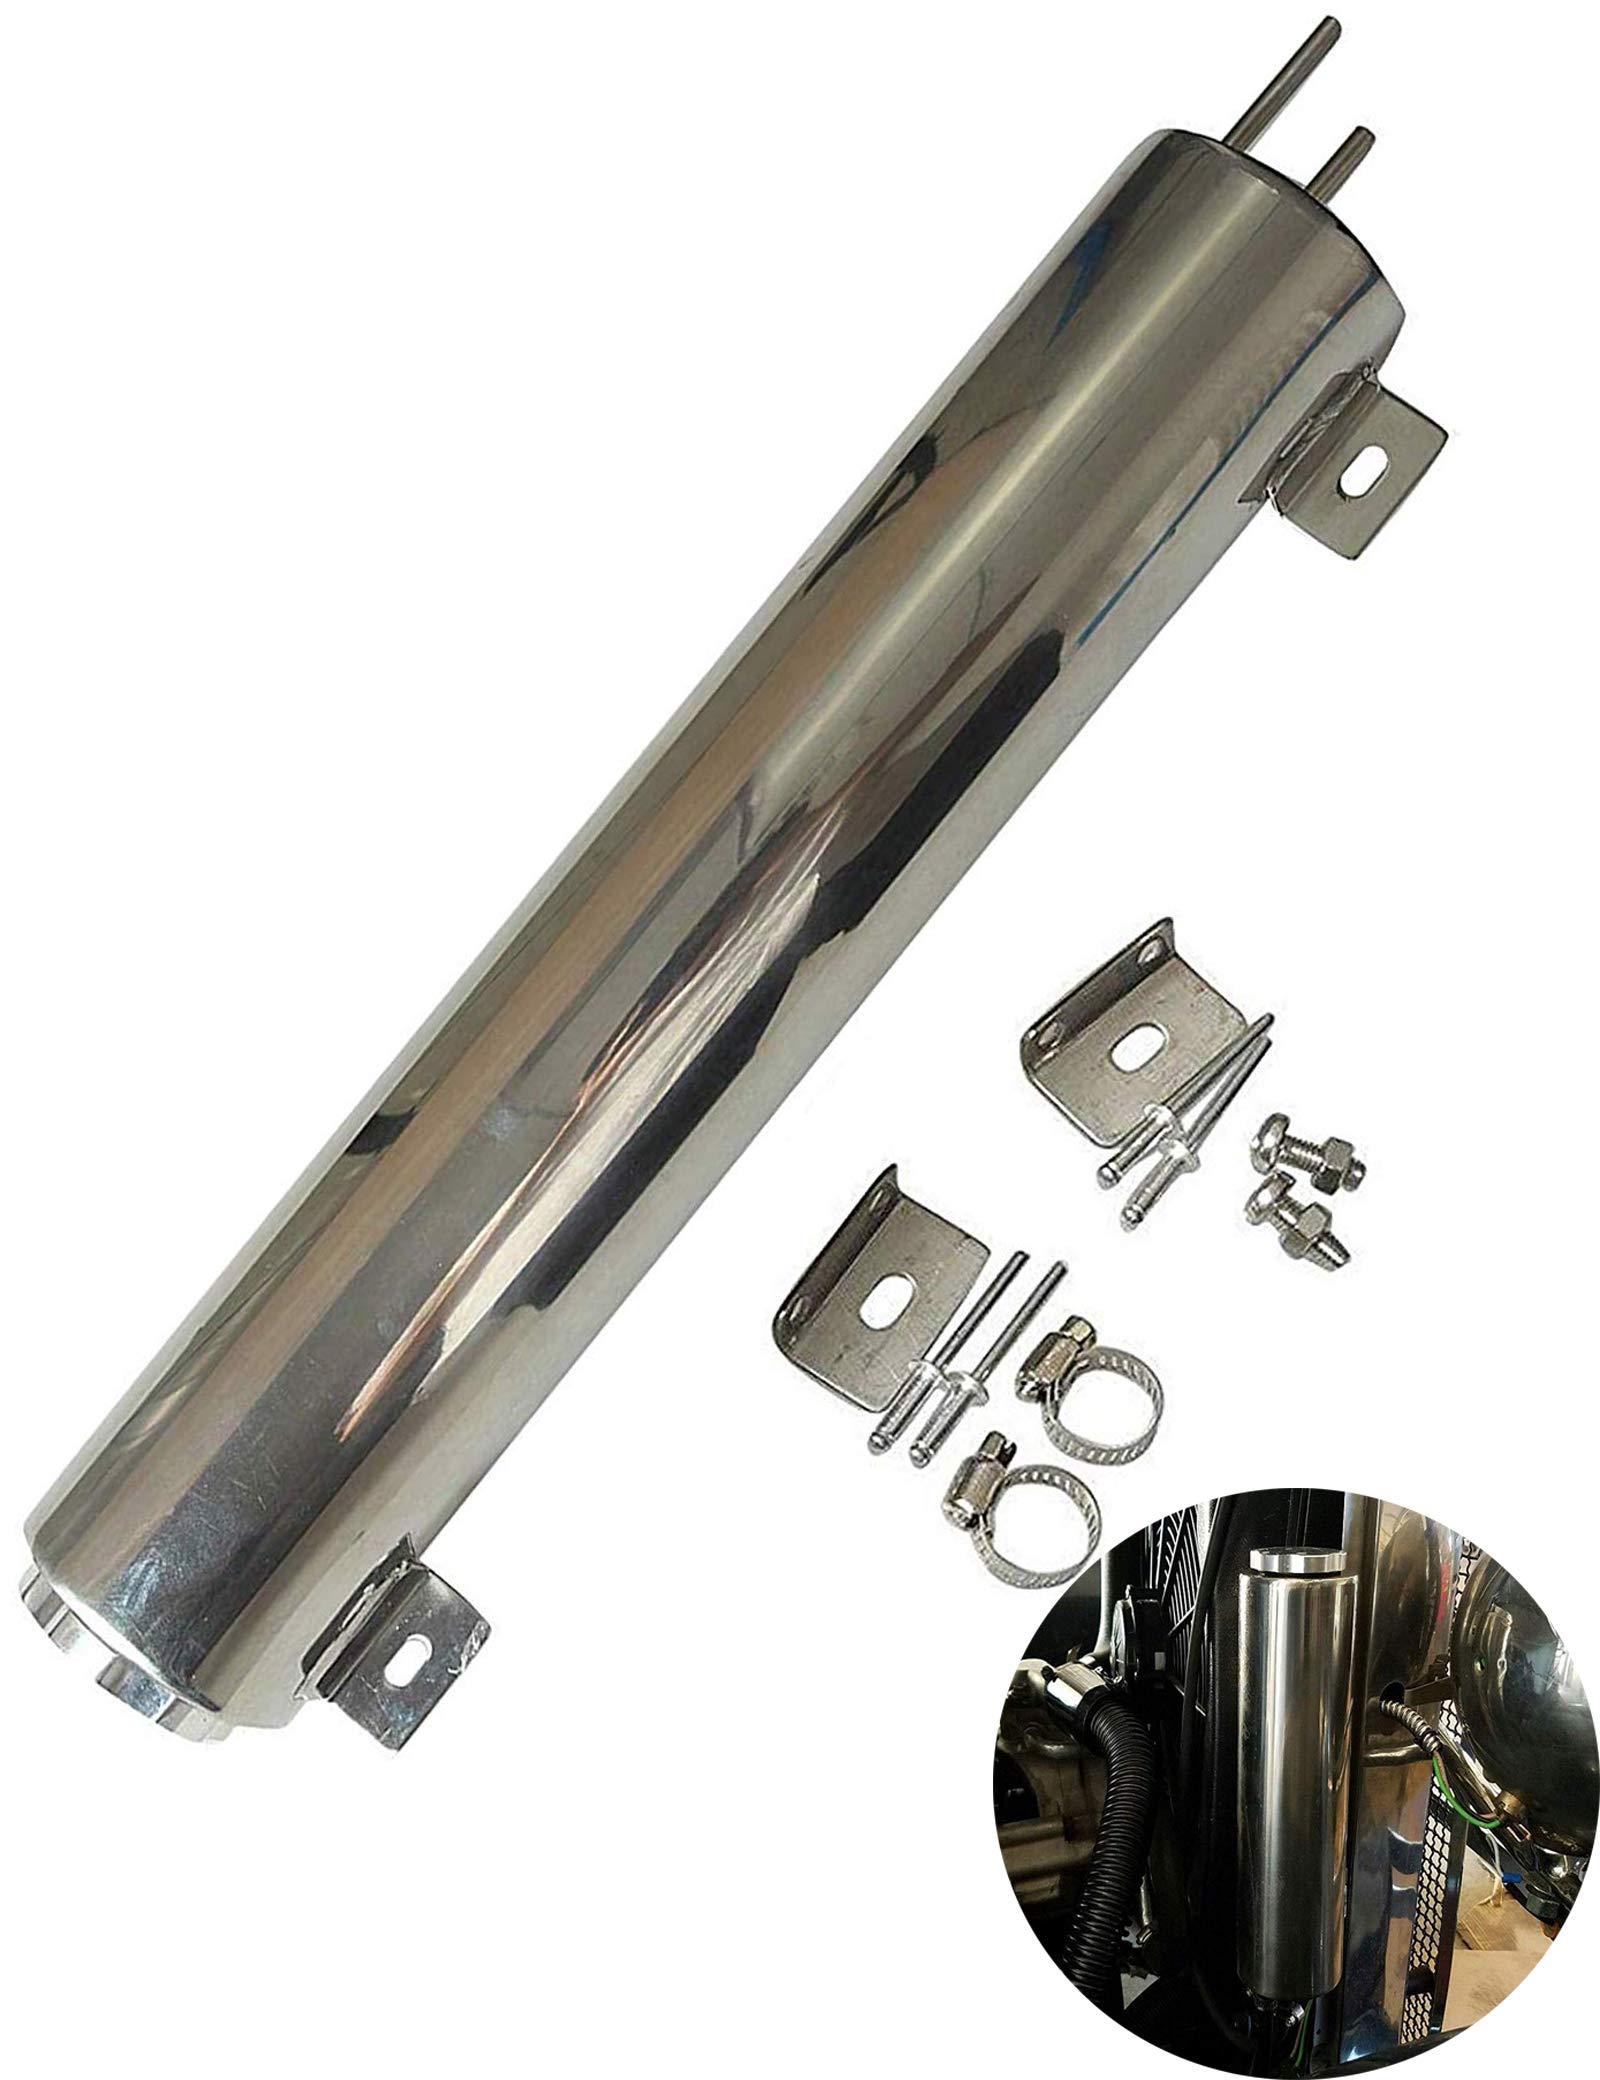 BLACKHORSE-RACING 3'' X 10'' Radiator Coolant Overflow Puke Tank Polished Stainless Steel 32OZ by BLACKHORSE-RACING (Image #1)